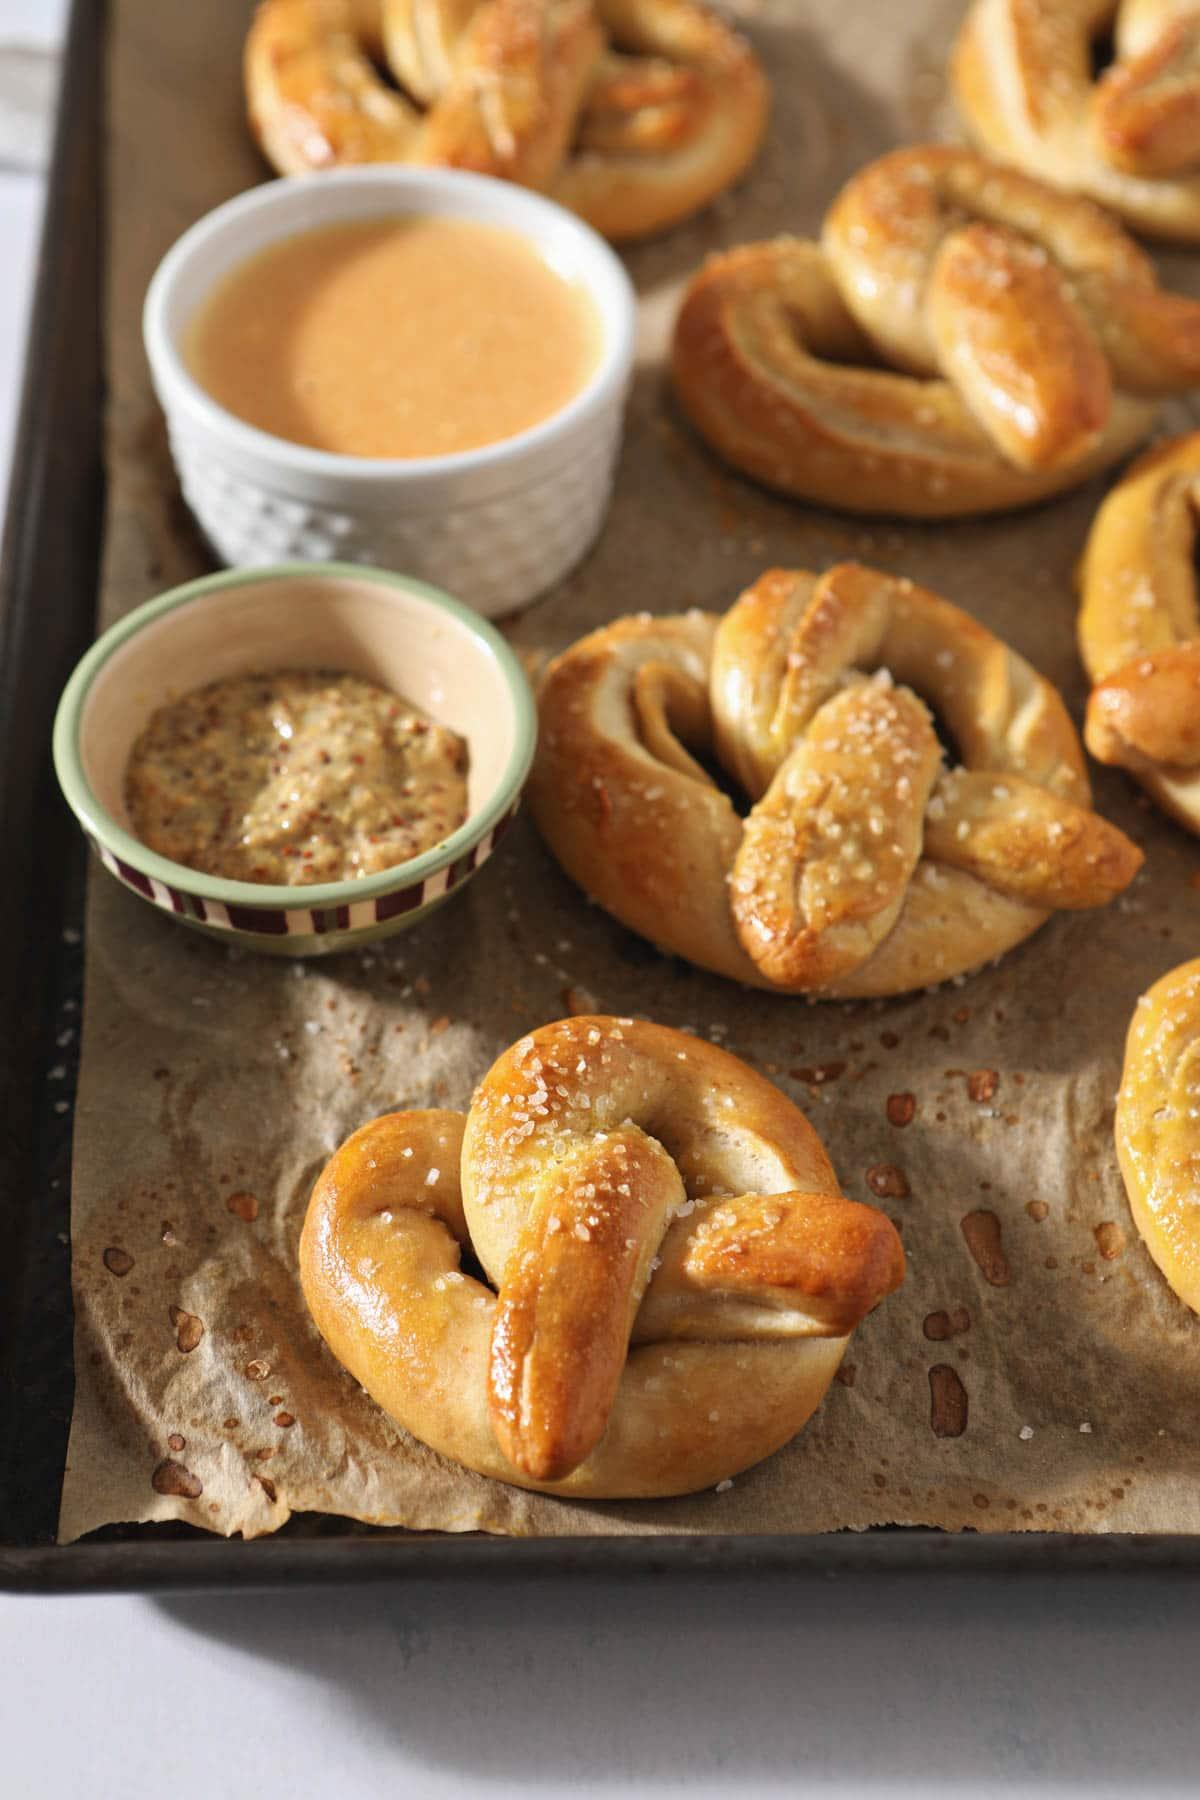 freshly baked pretzels beside honey mustard and cheese dip